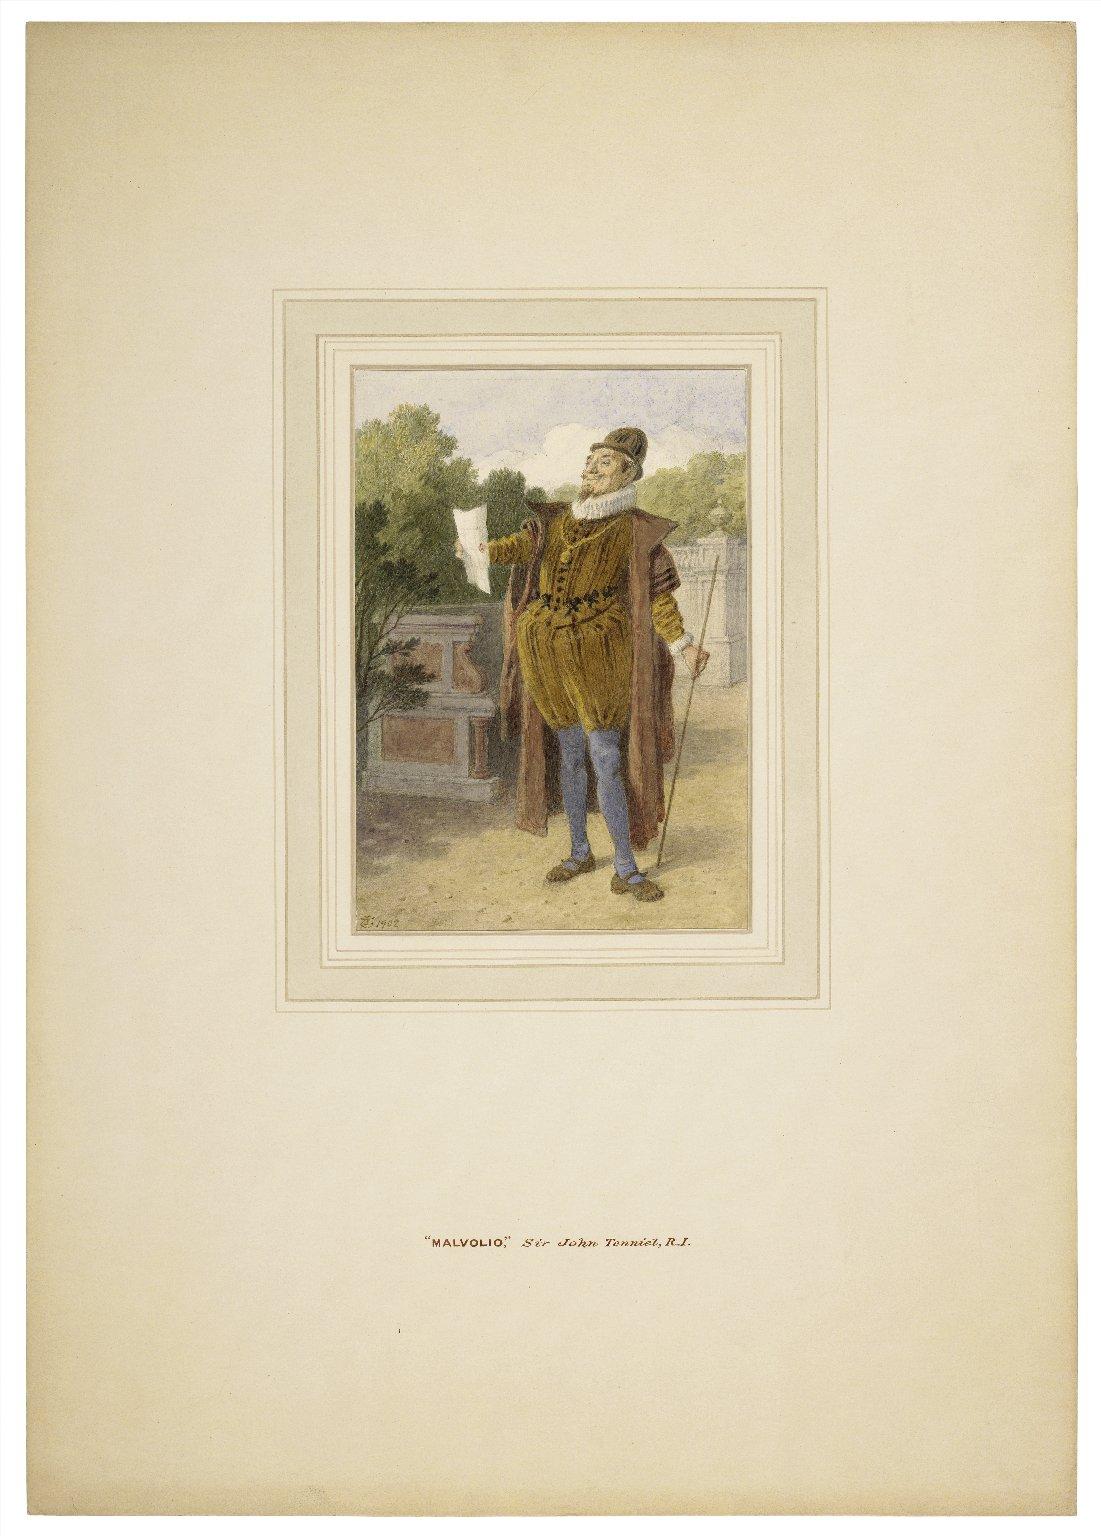 Twelfth night, Malvolio [graphic] / John Tenniel.